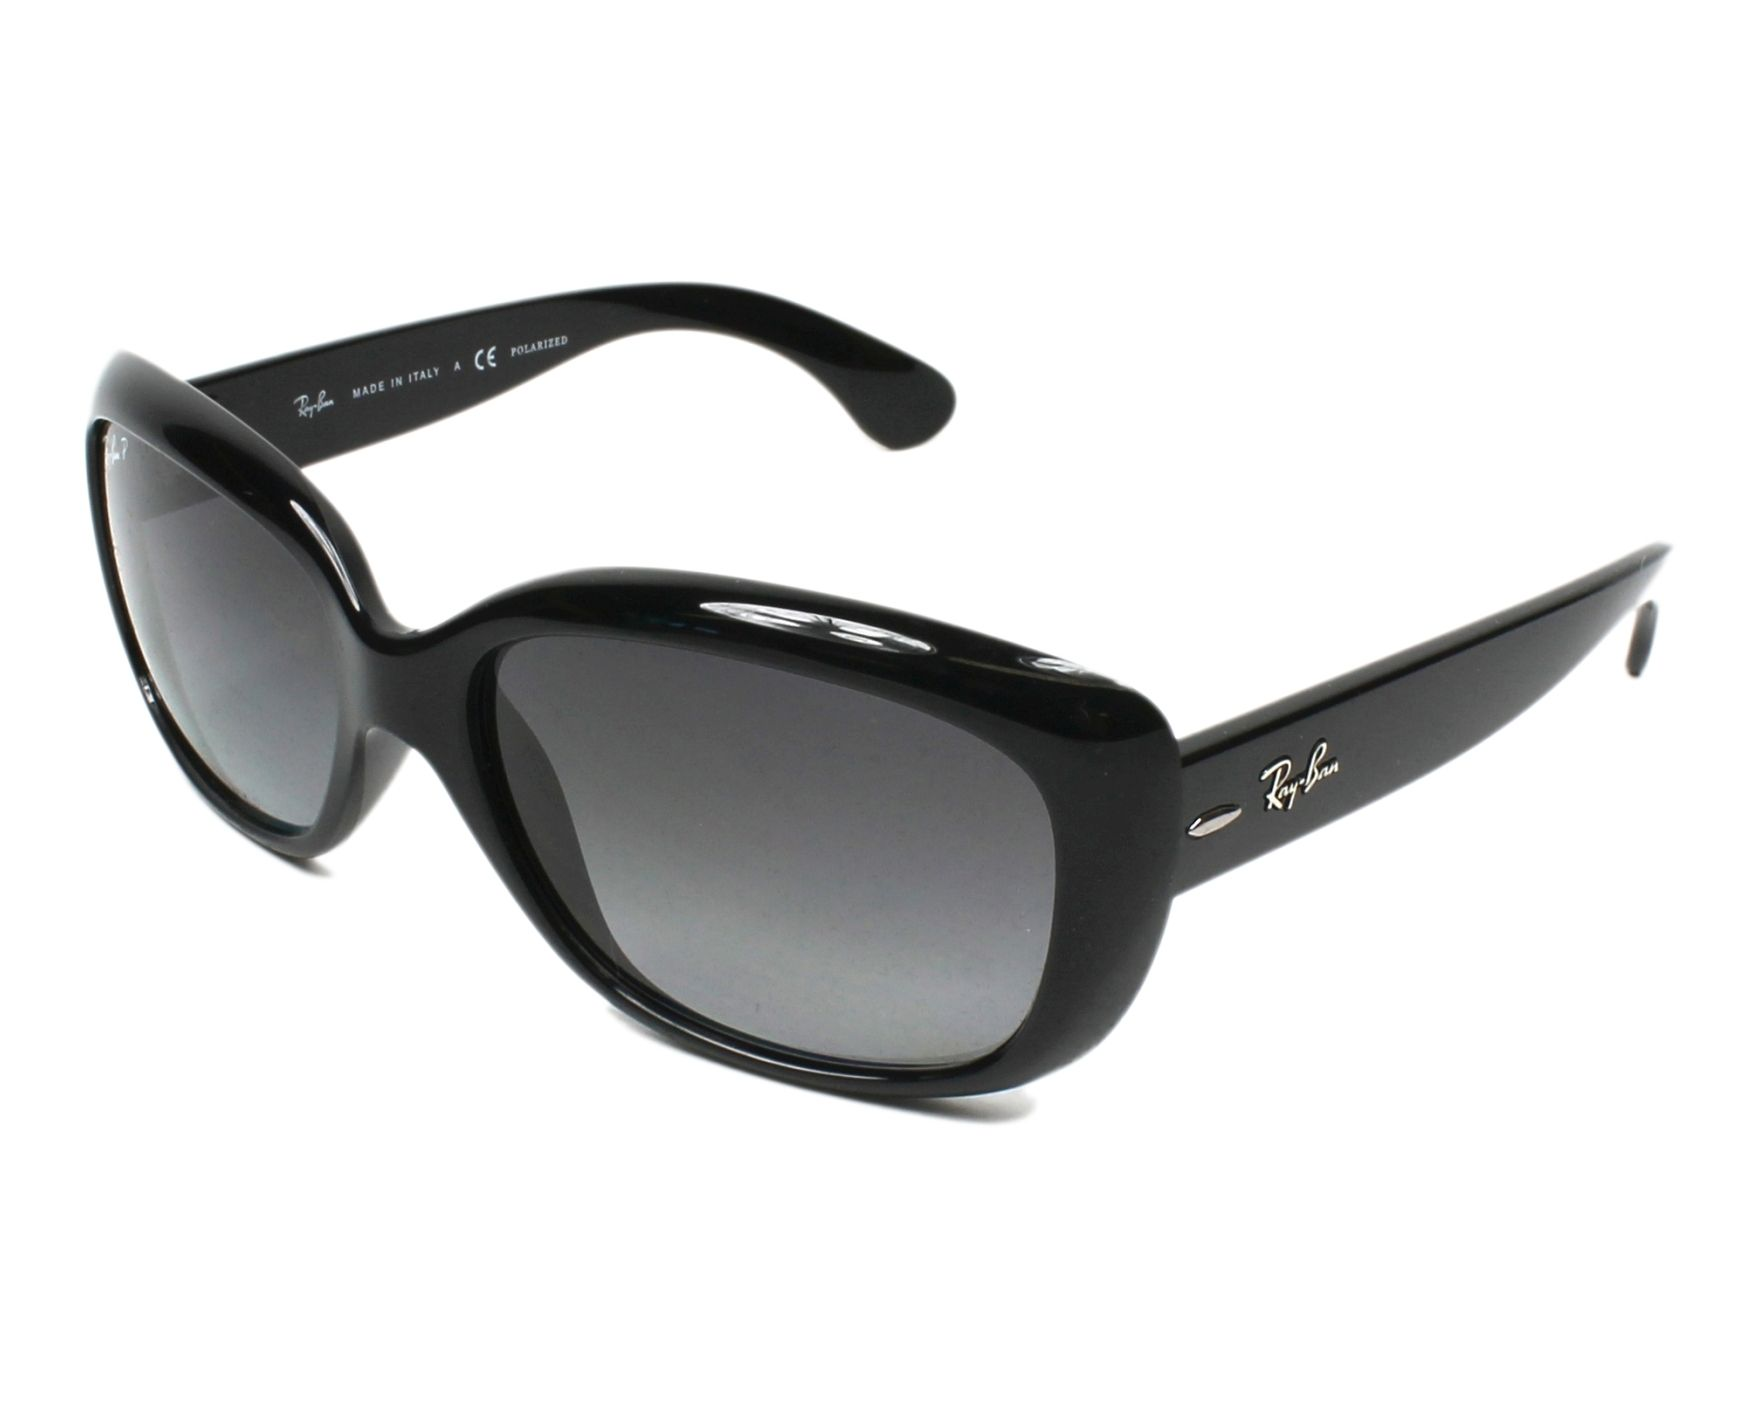 325e64944cf Sunglasses Ray-Ban RB-4101 601 T3 58-19 Black profile view